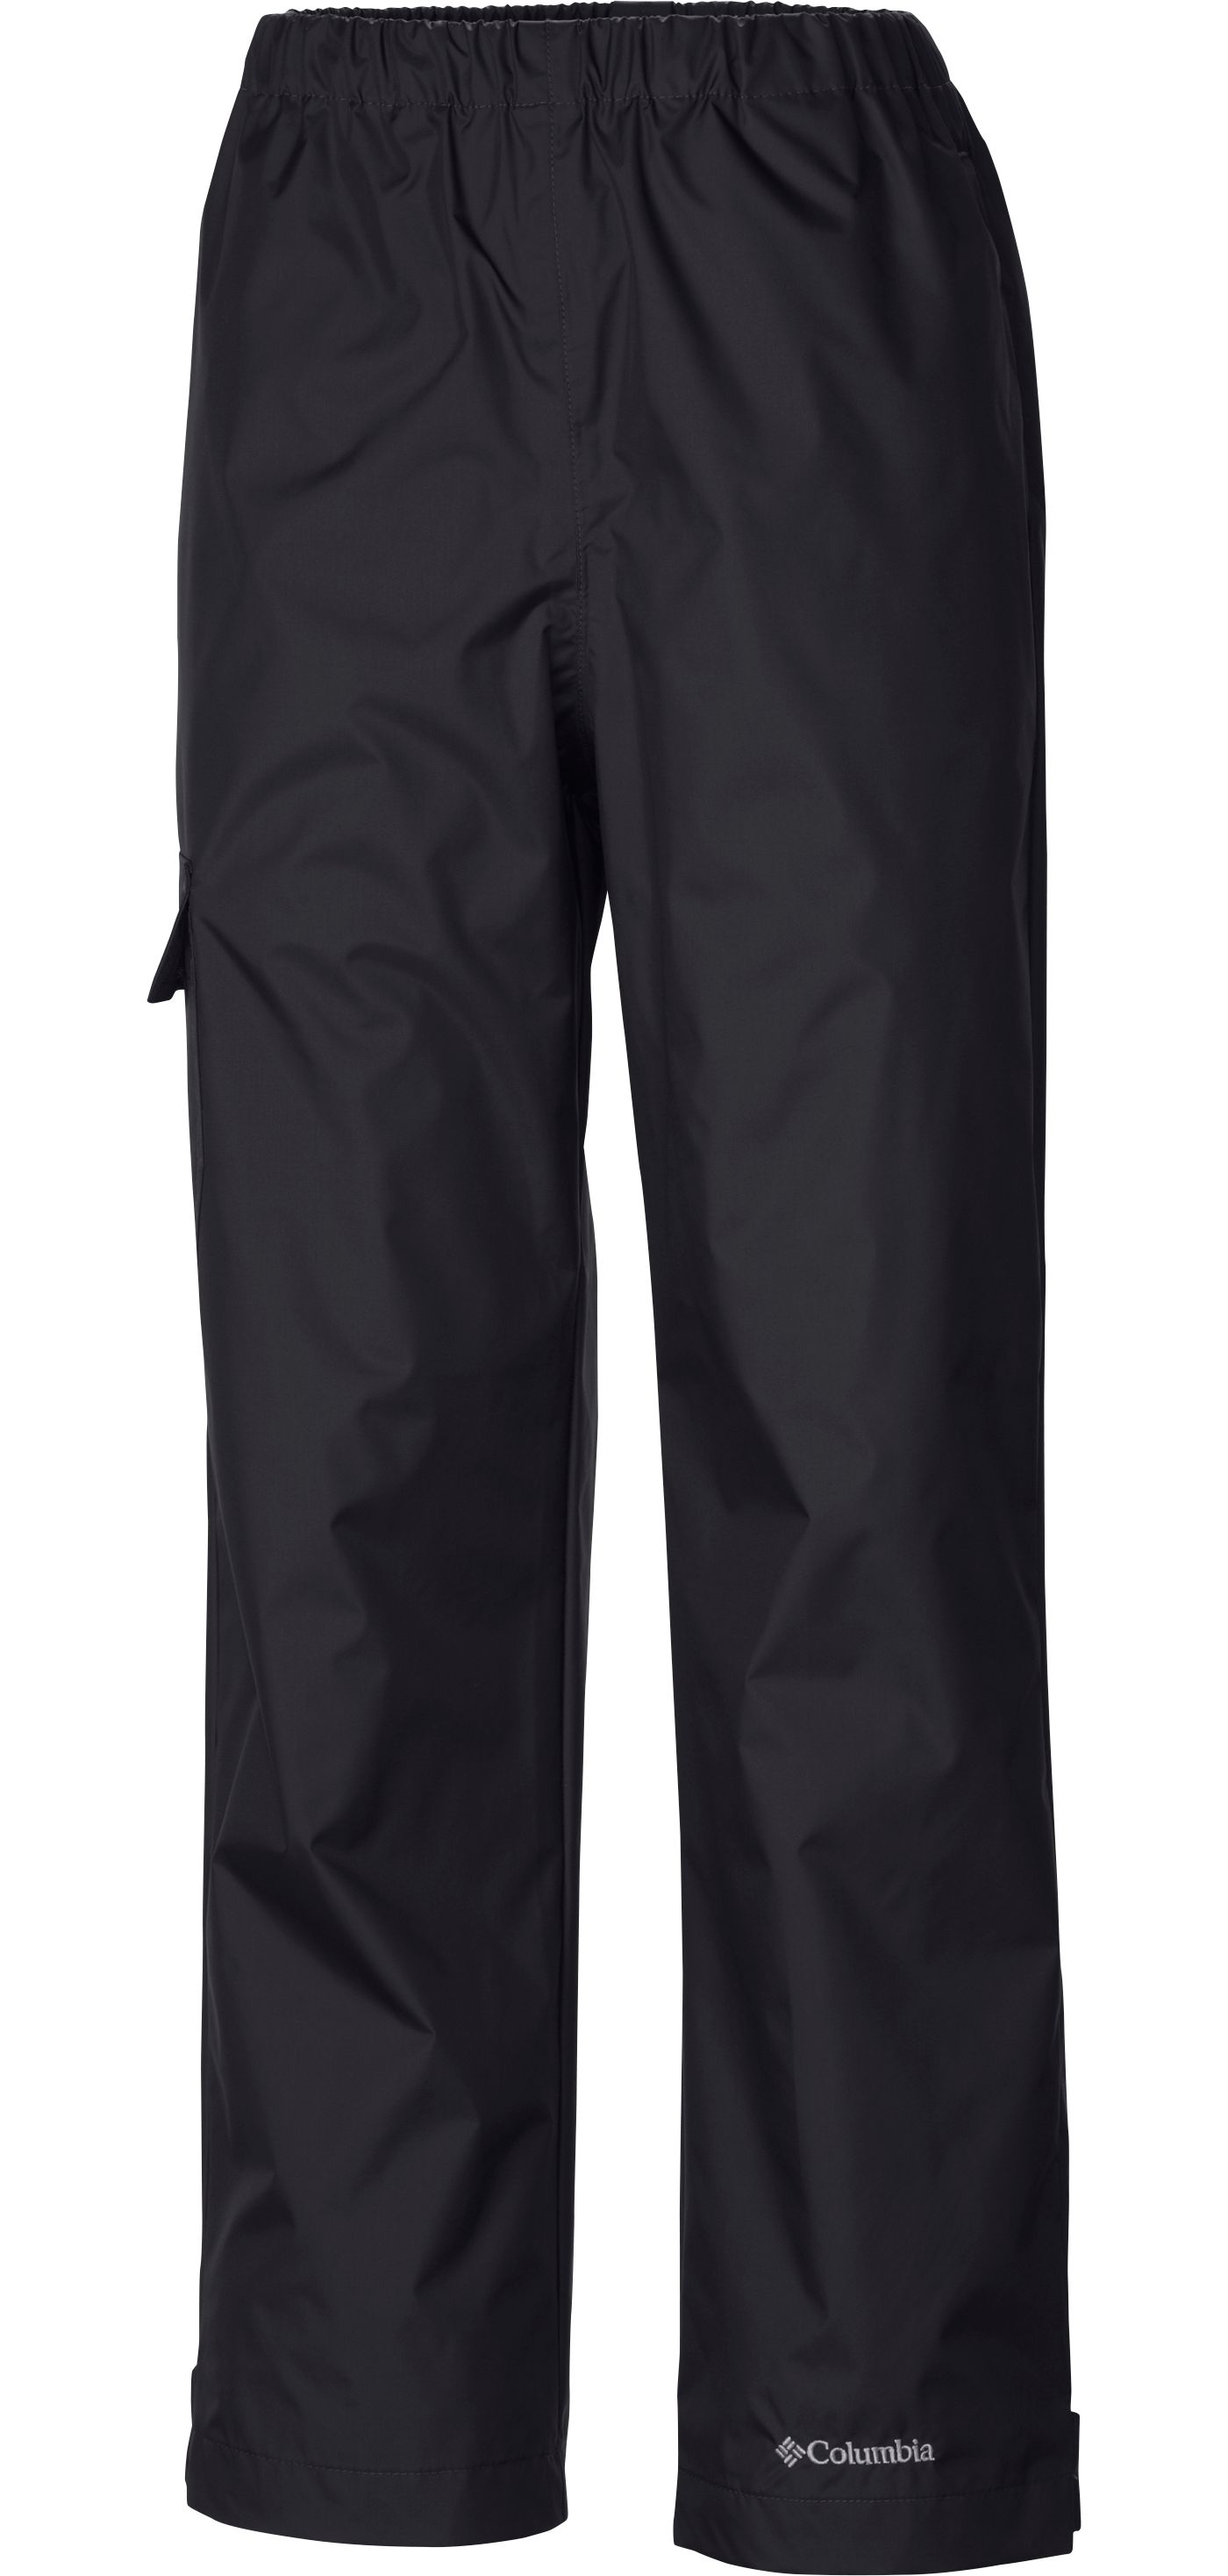 Columbia Youth Cypress Brook II Shell Pants